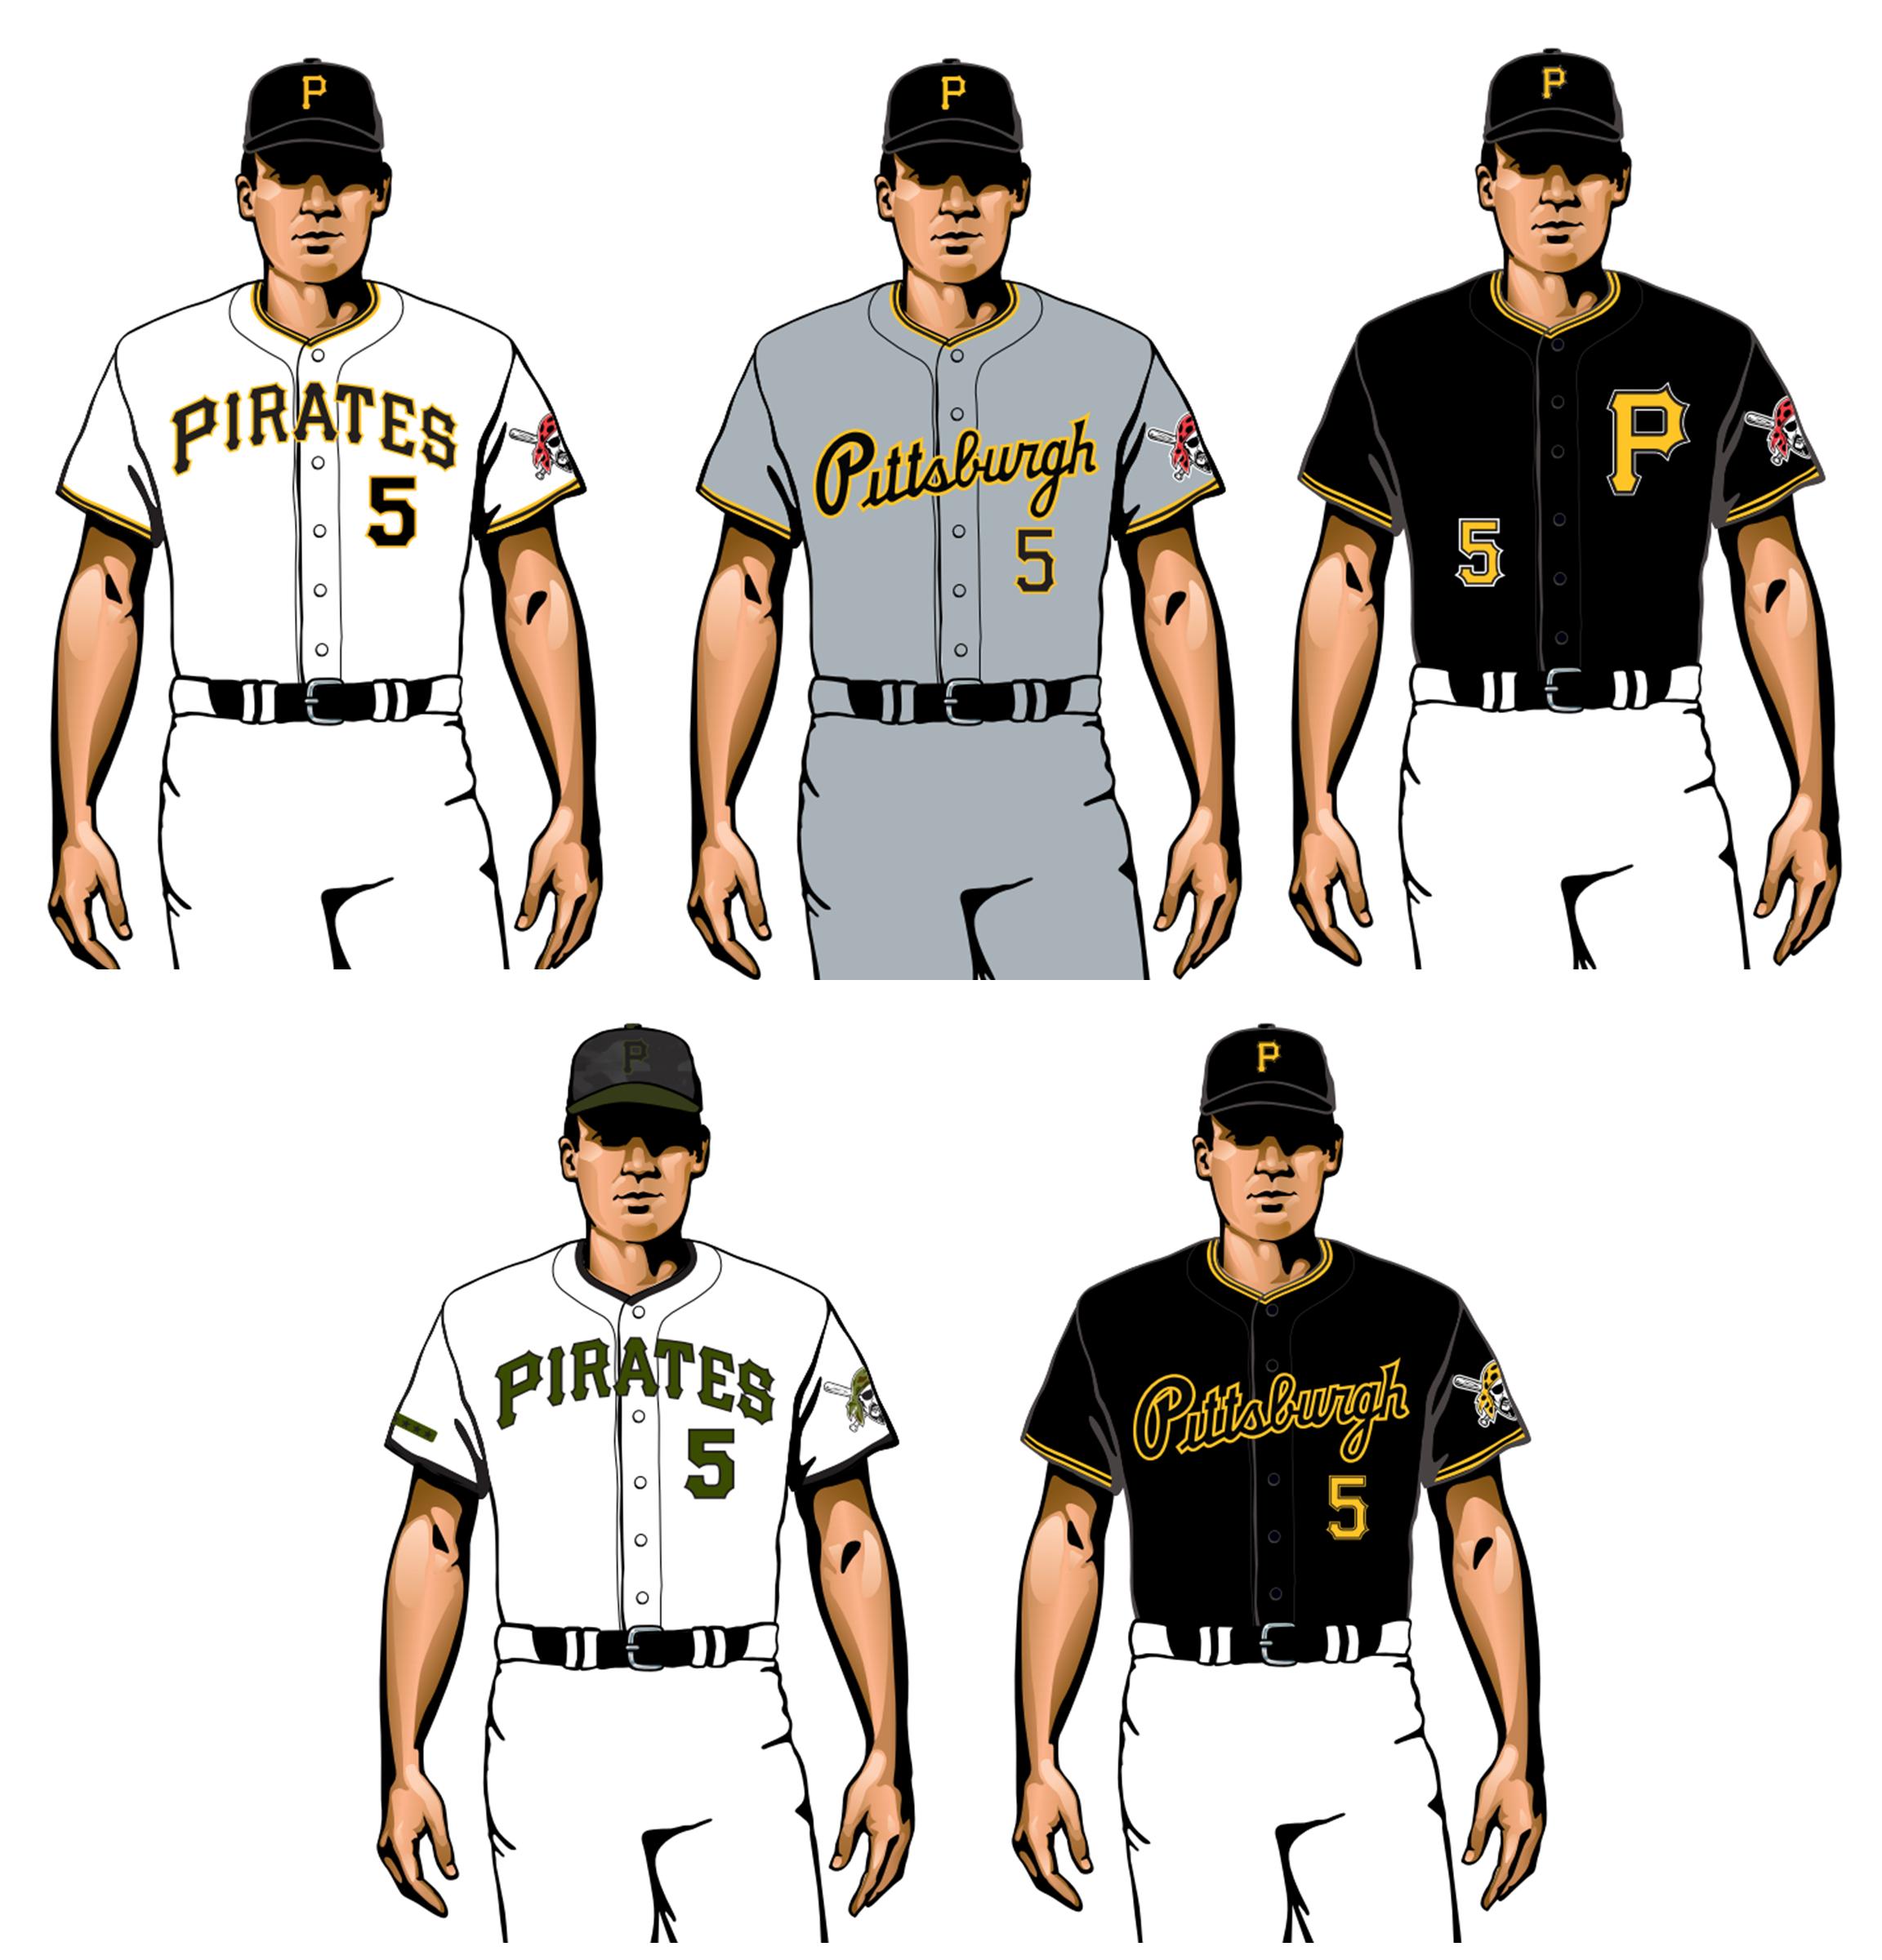 piratas de pittsburgh 2020 uniformes